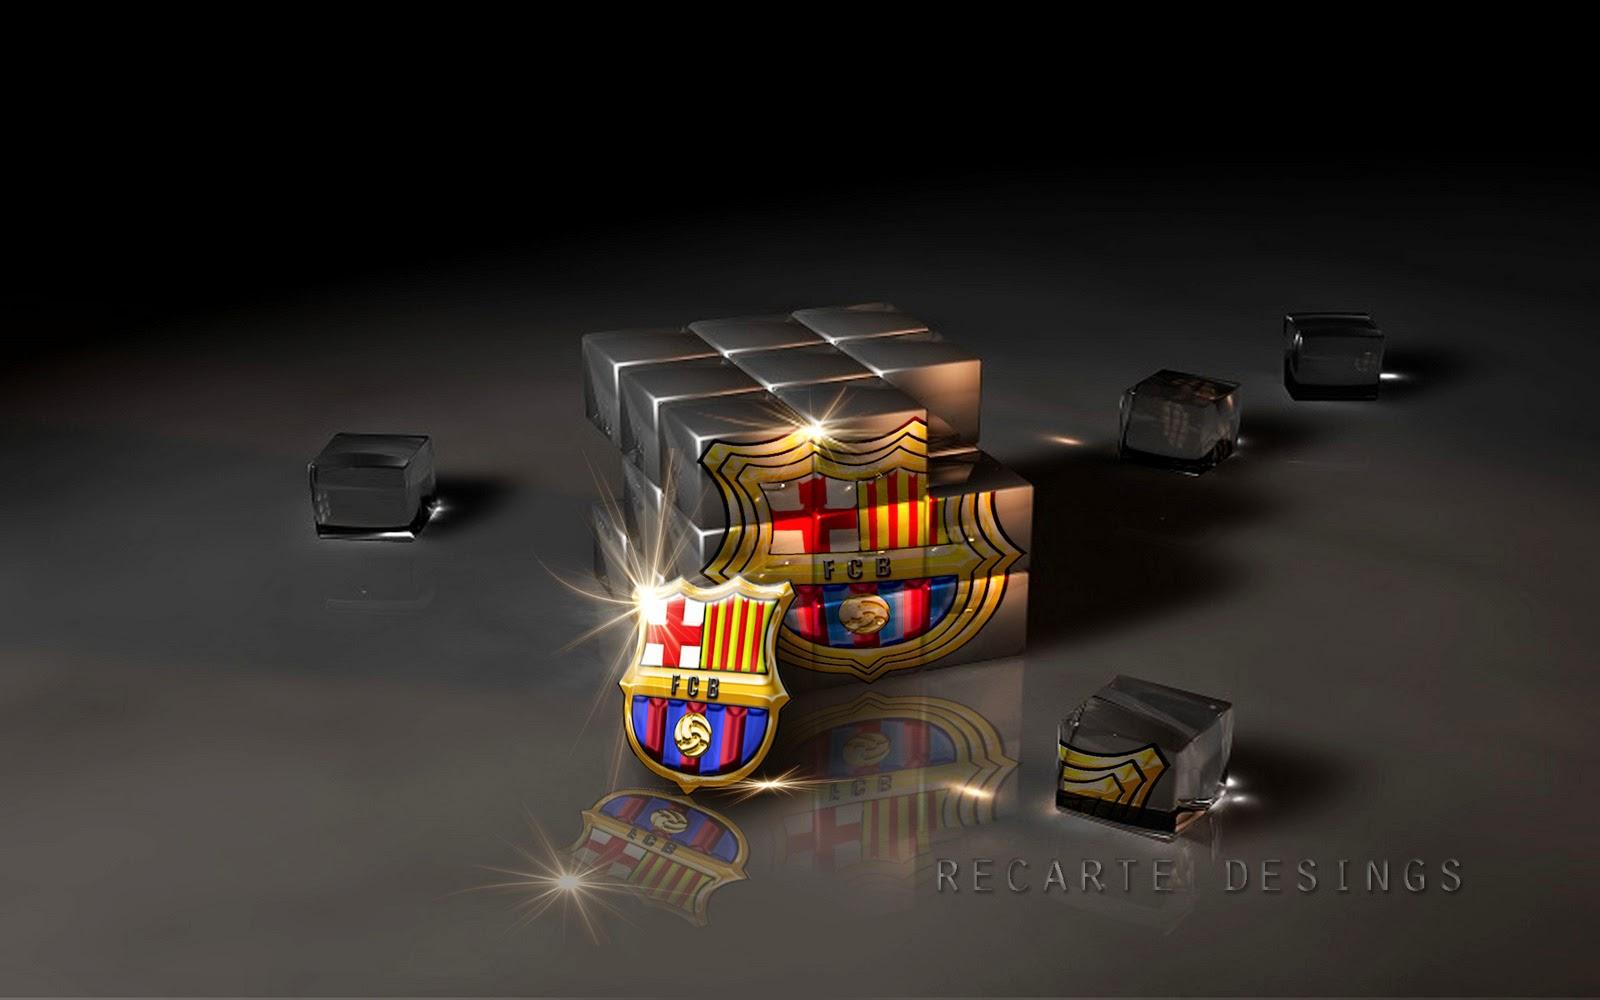 Wallpaper Real Madrid Hd Barcelona Football Club Wallpaper Football Wallpaper Hd